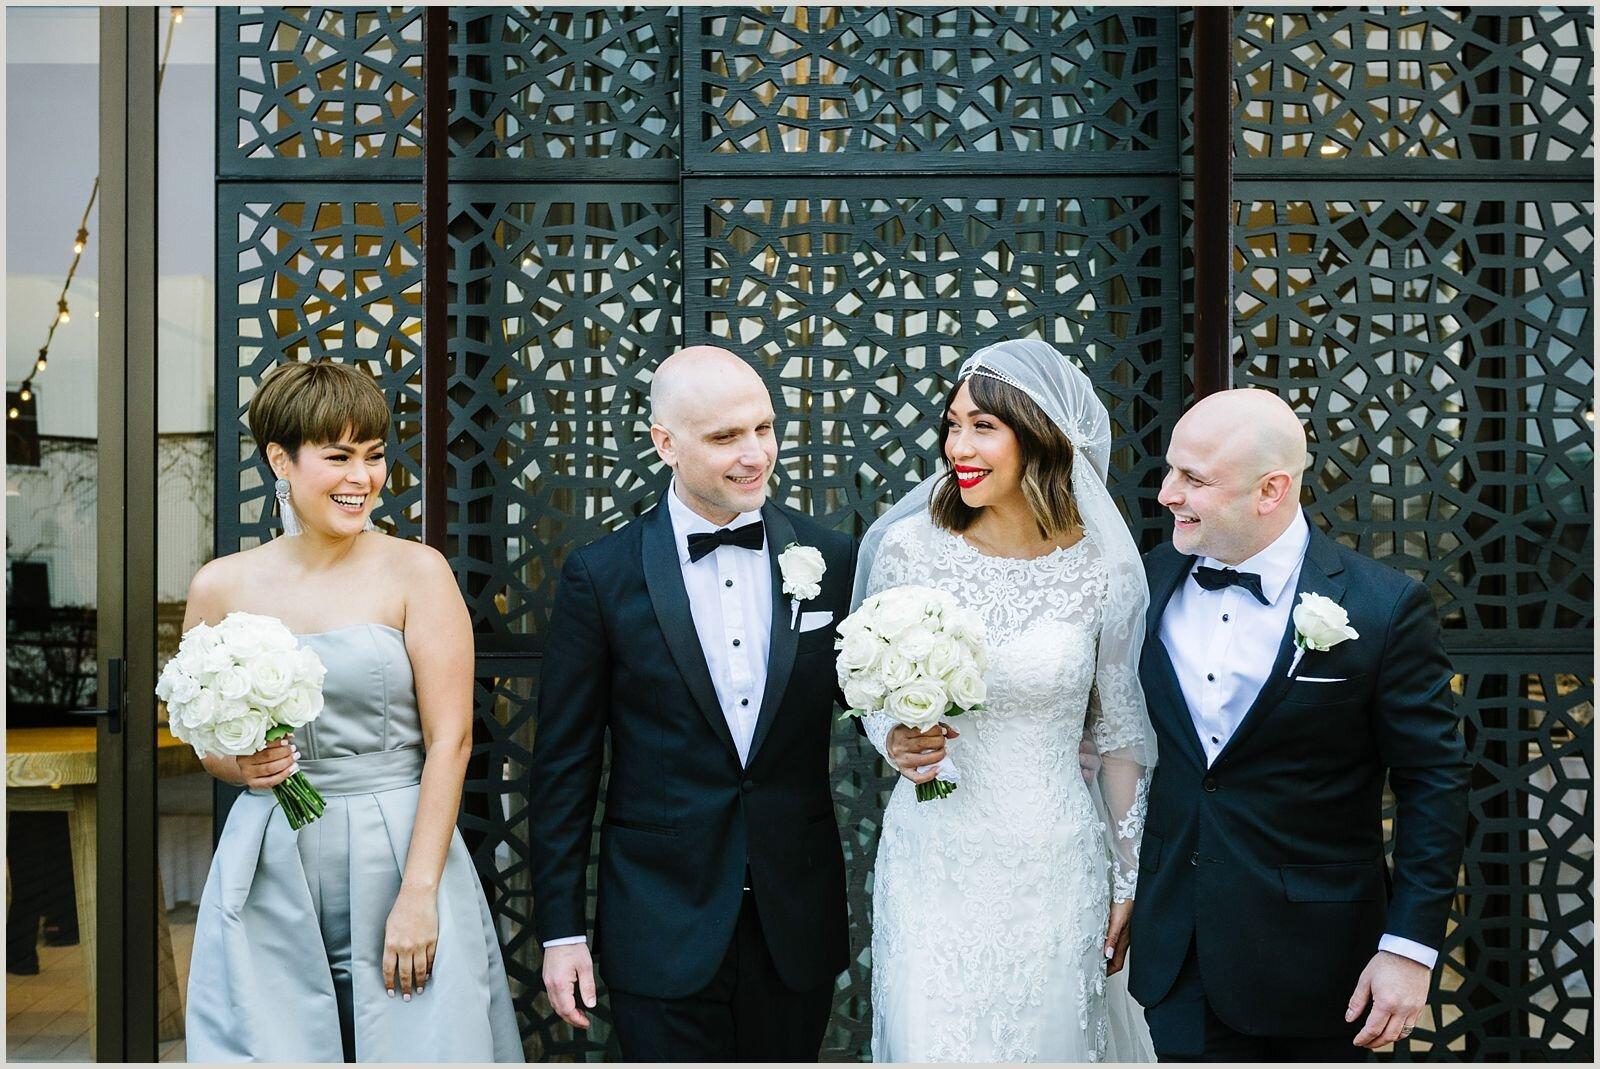 joseph_koprek_wedding_melbourne_the_prince_deck_0044.jpg